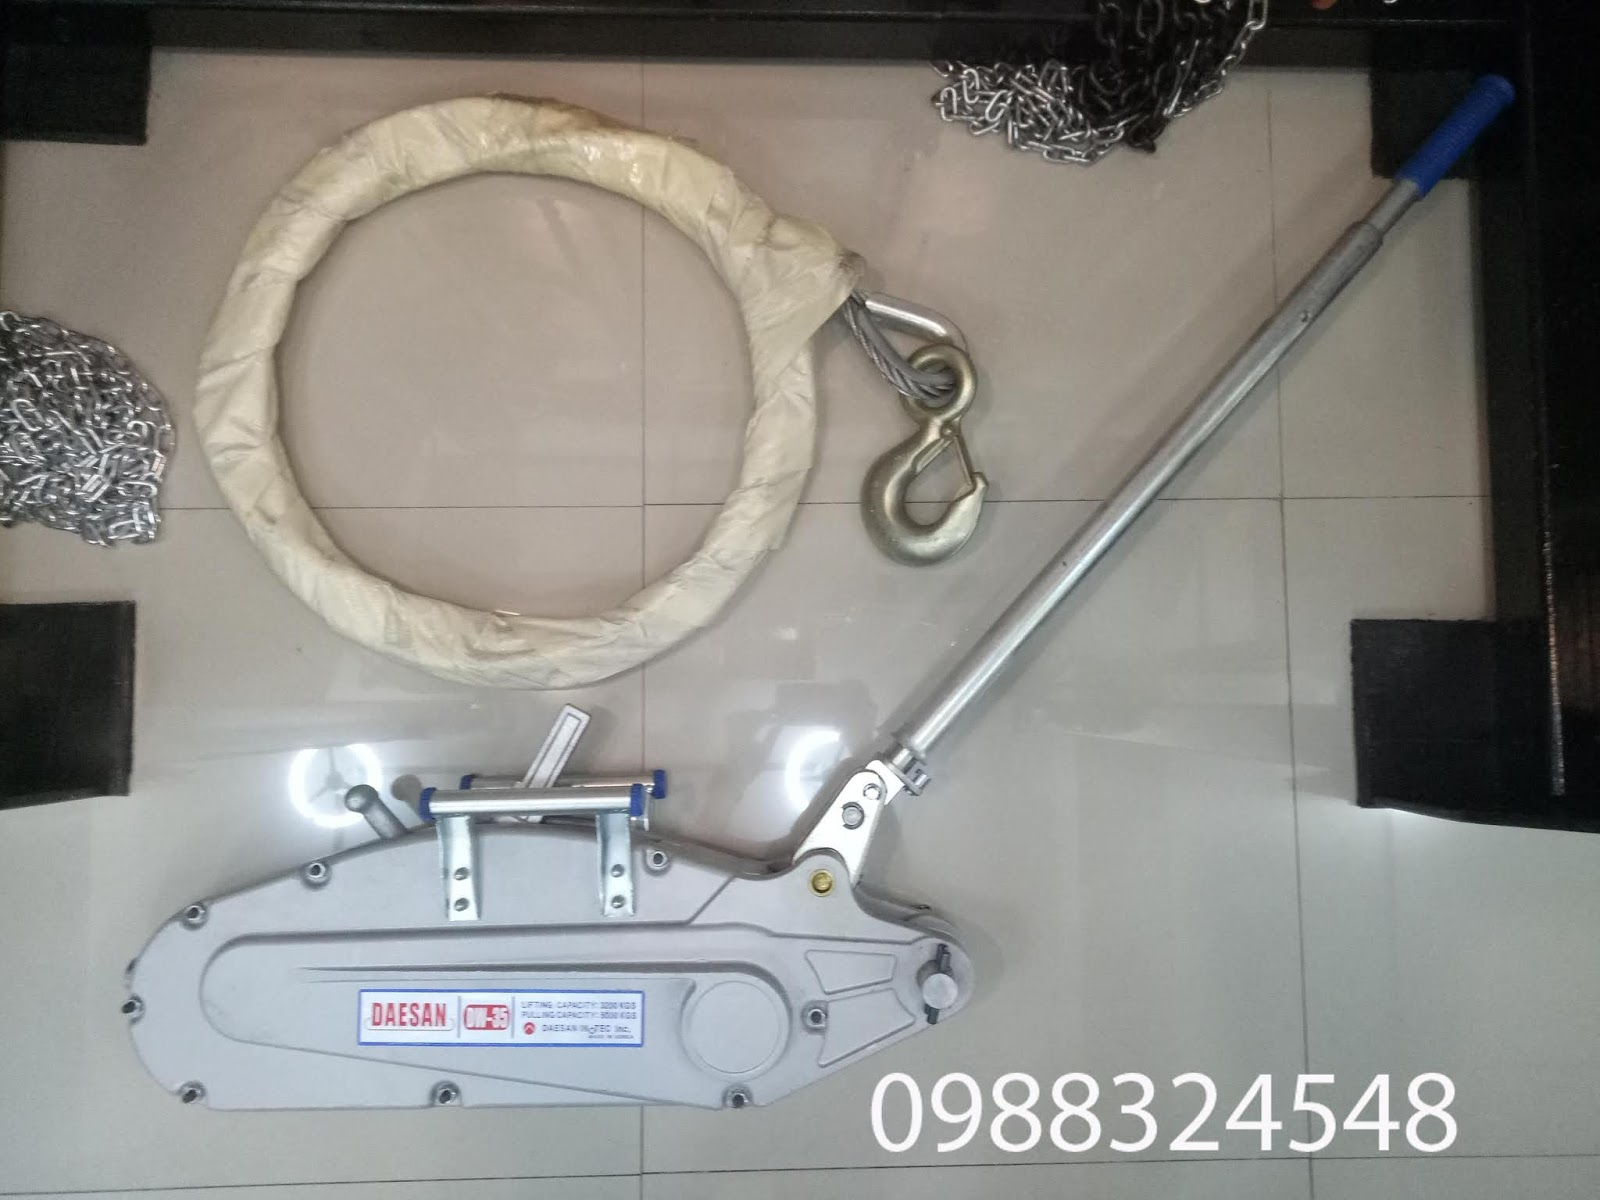 Tirfor căng cáp Daesan DW-35 3.2 tấn